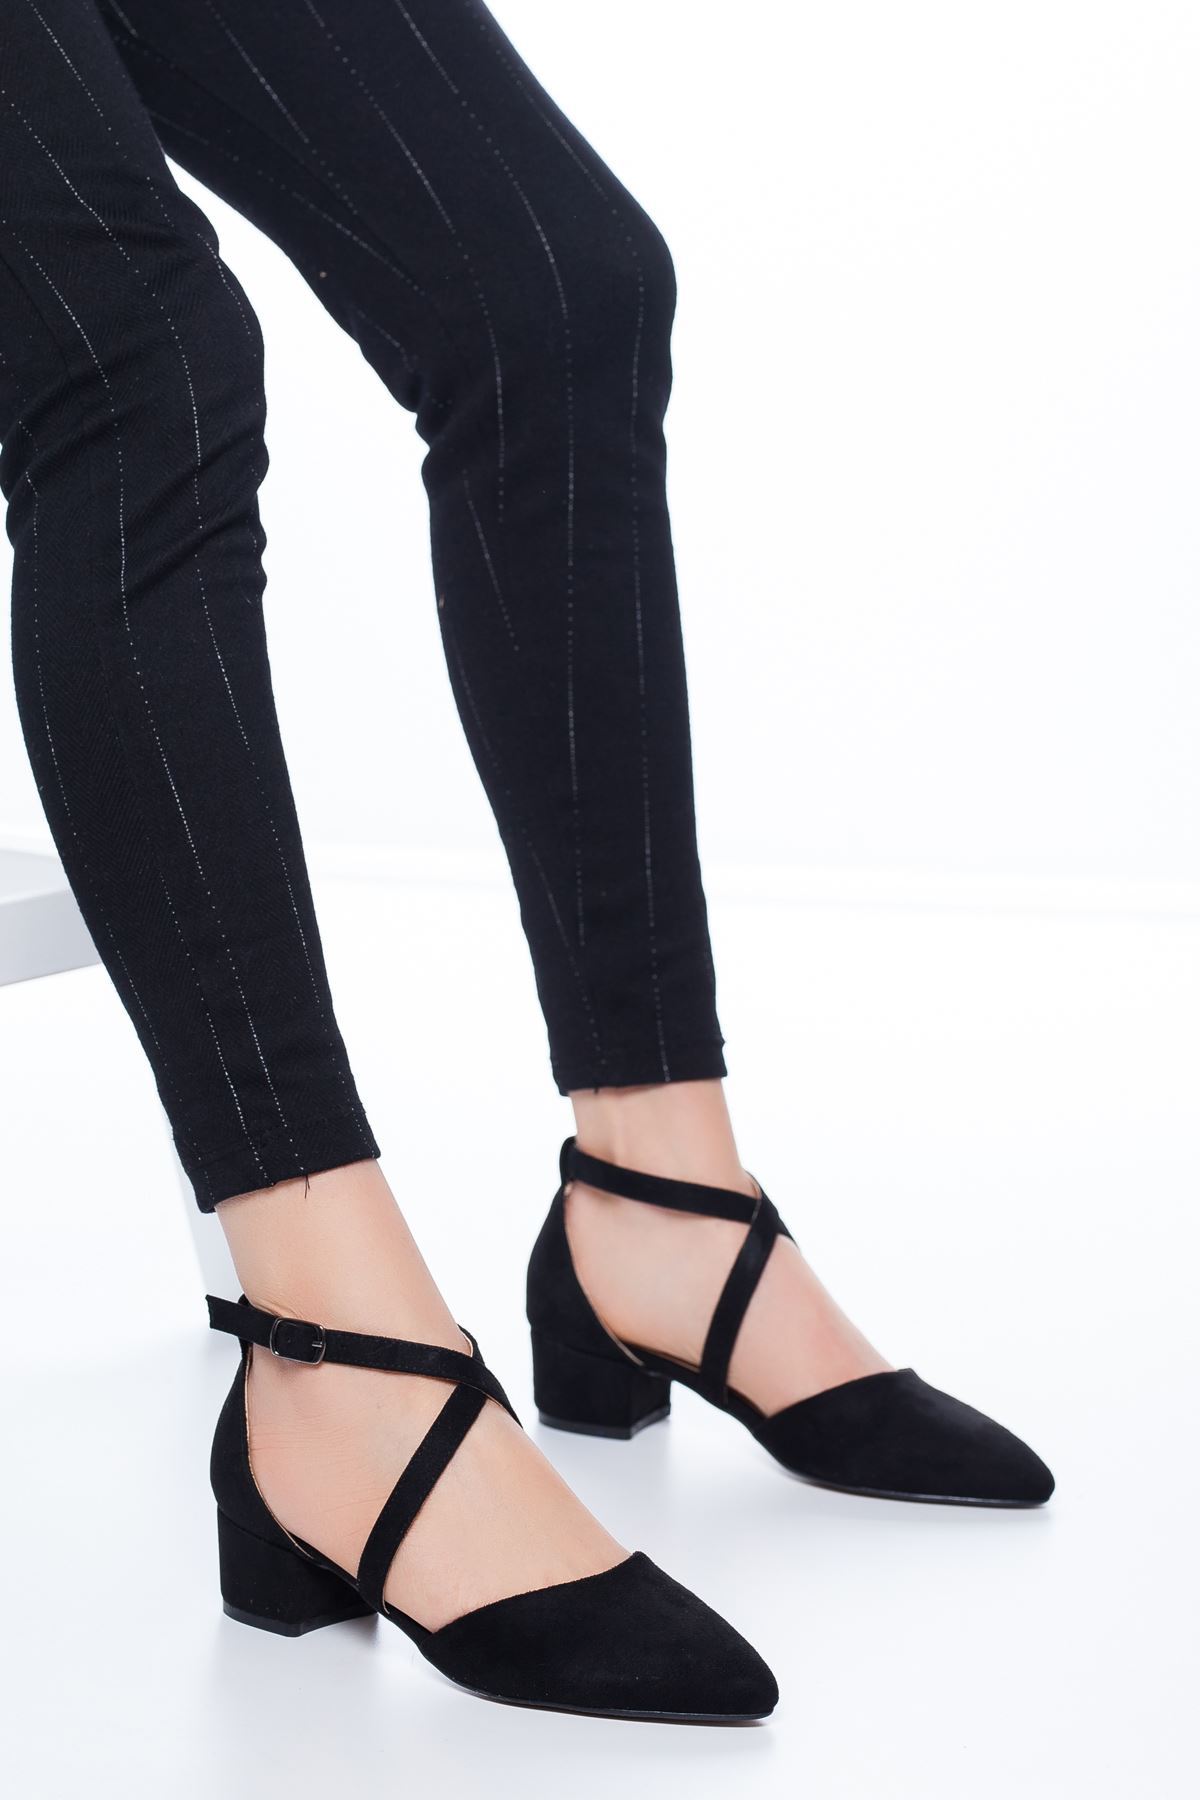 Lexon Topuklu Süet Ayakkabı Siyah